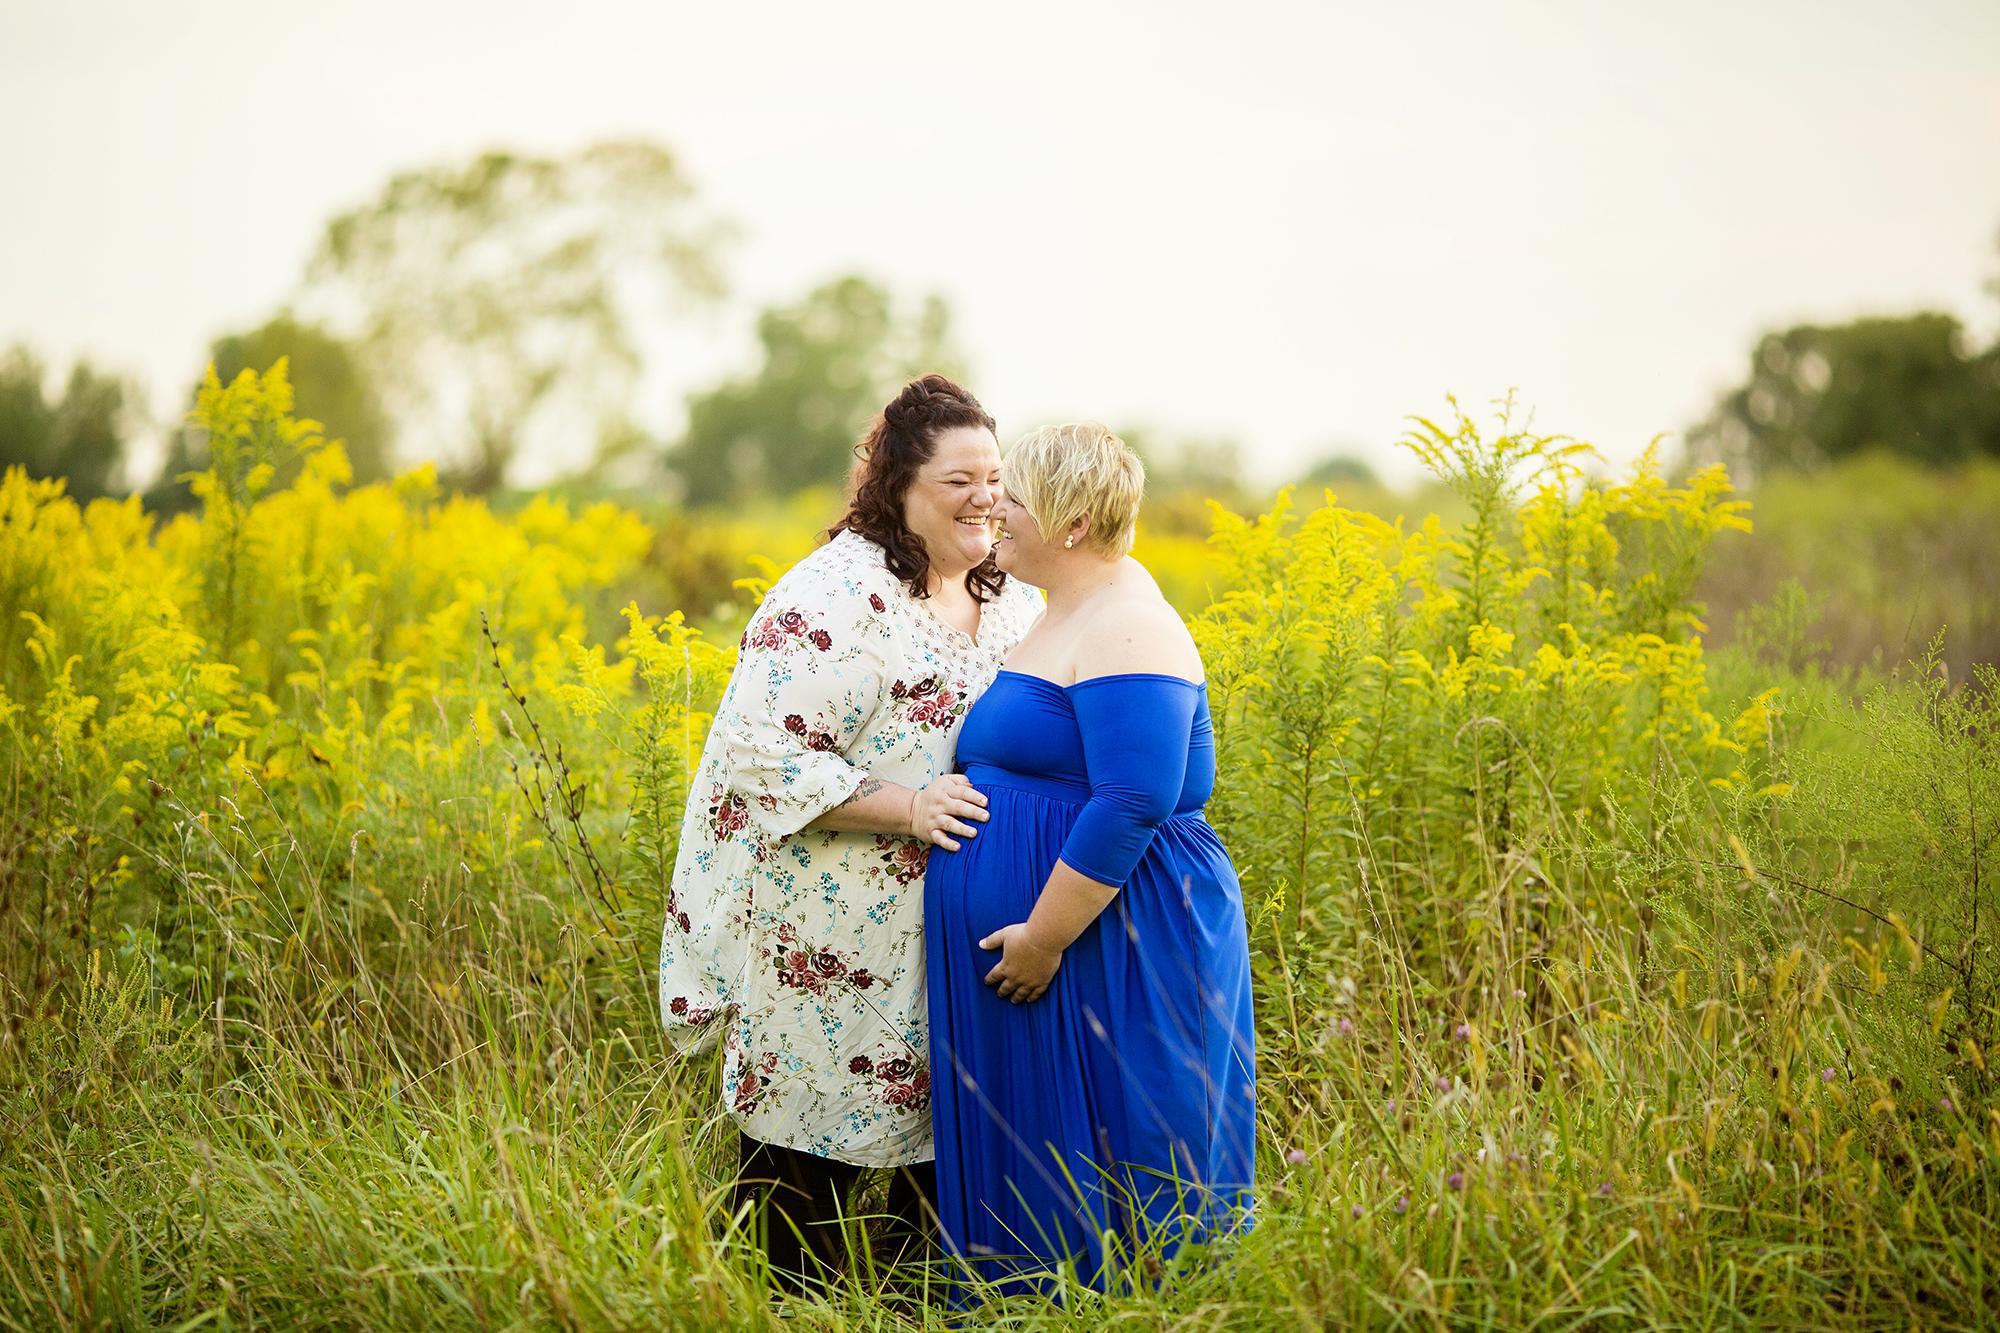 Seriously_Sabrina_Photography_Lexington_Kentucky_Maternity_Portraits_Hisle_Farm_JC1.jpg